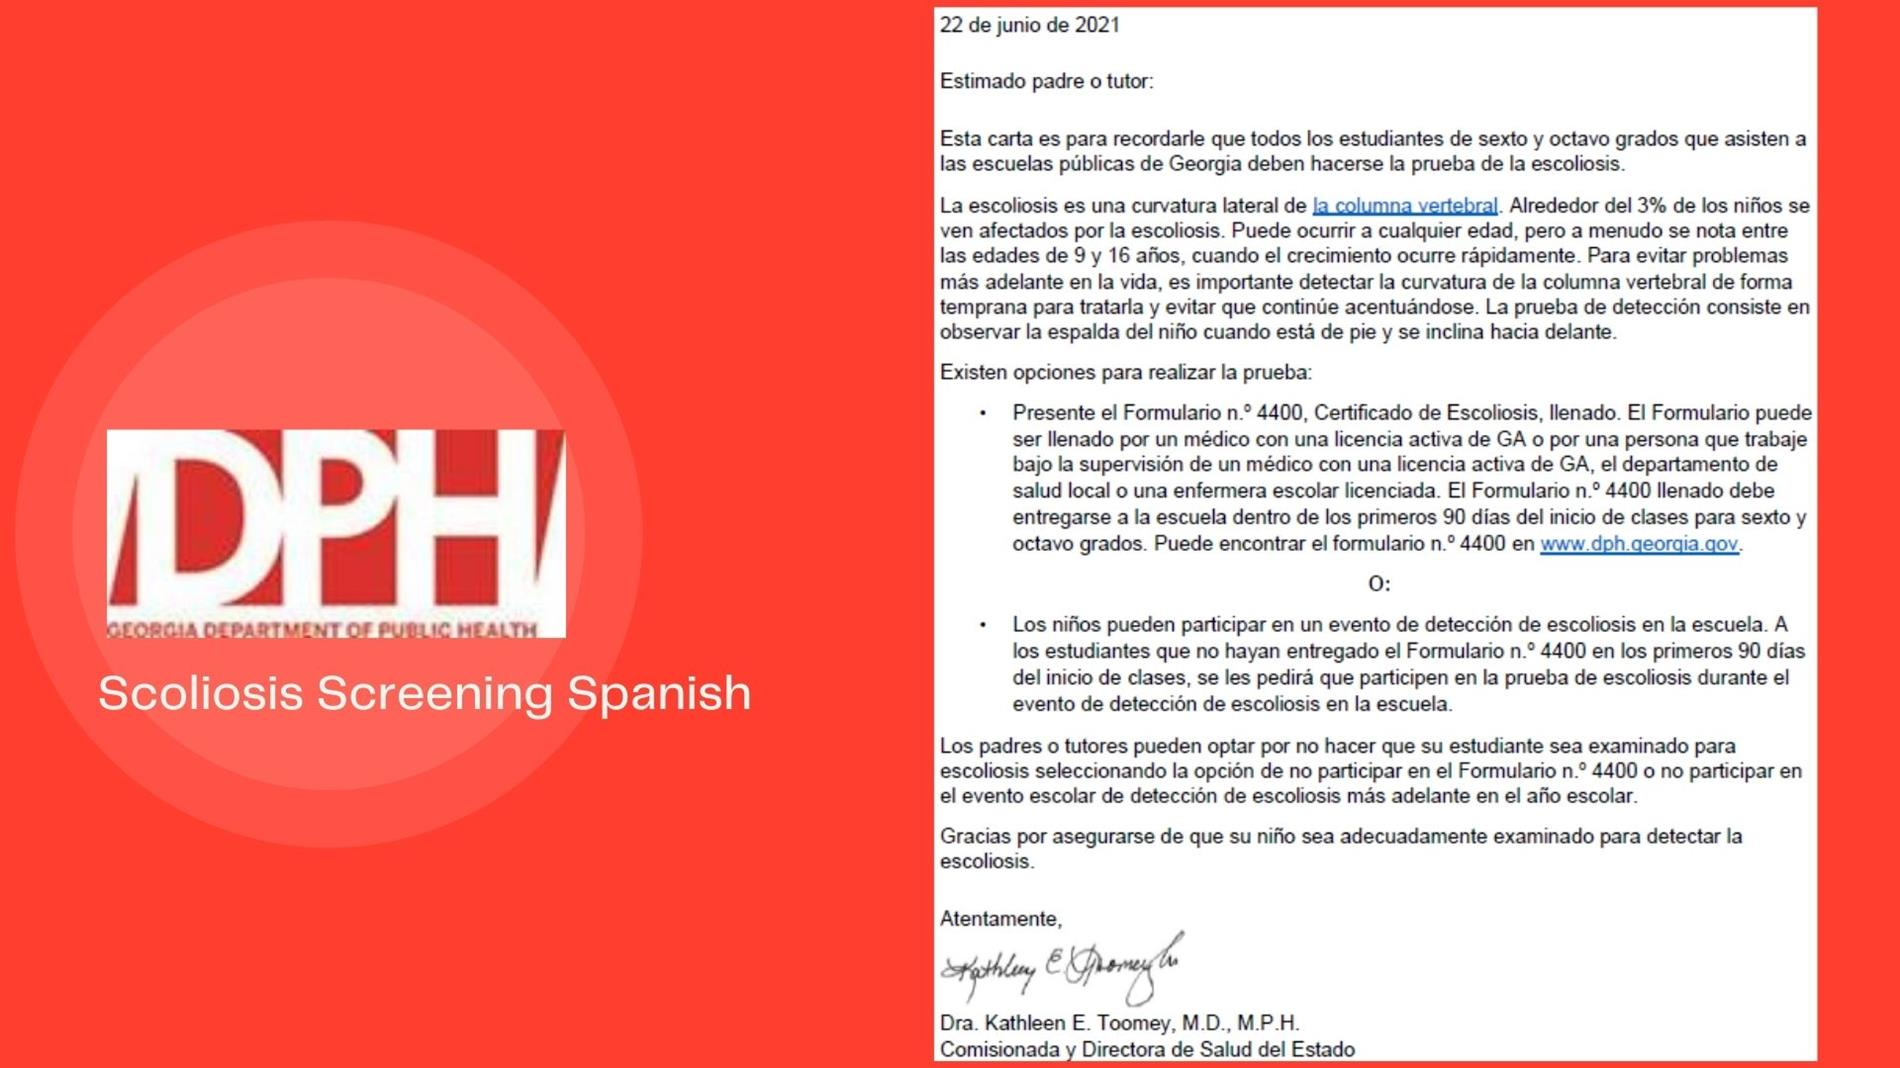 Scoliosis Screening Spanish